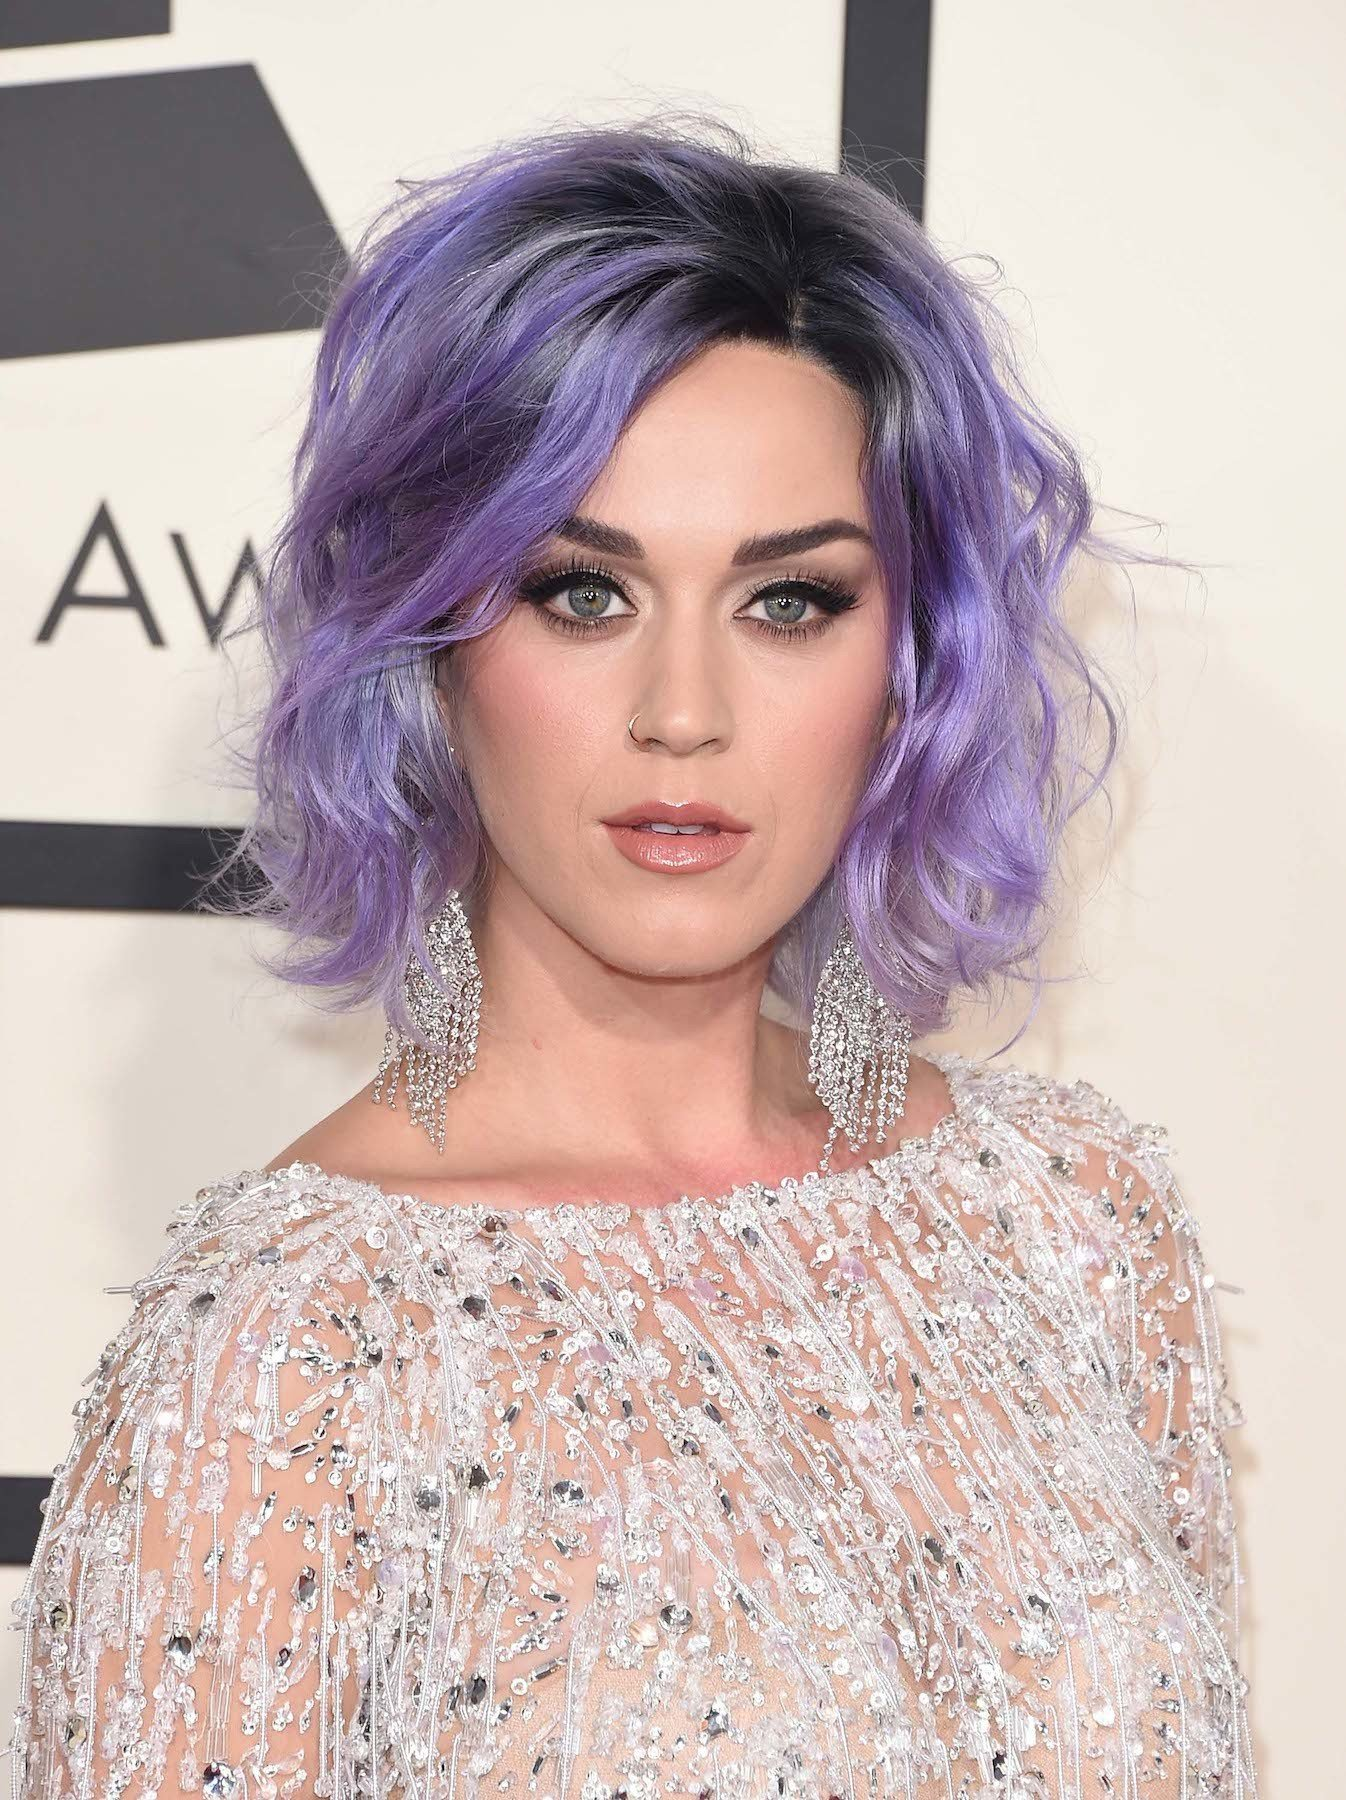 Katy Perry Warna rambut ungu pastel pada akar rambut hitam